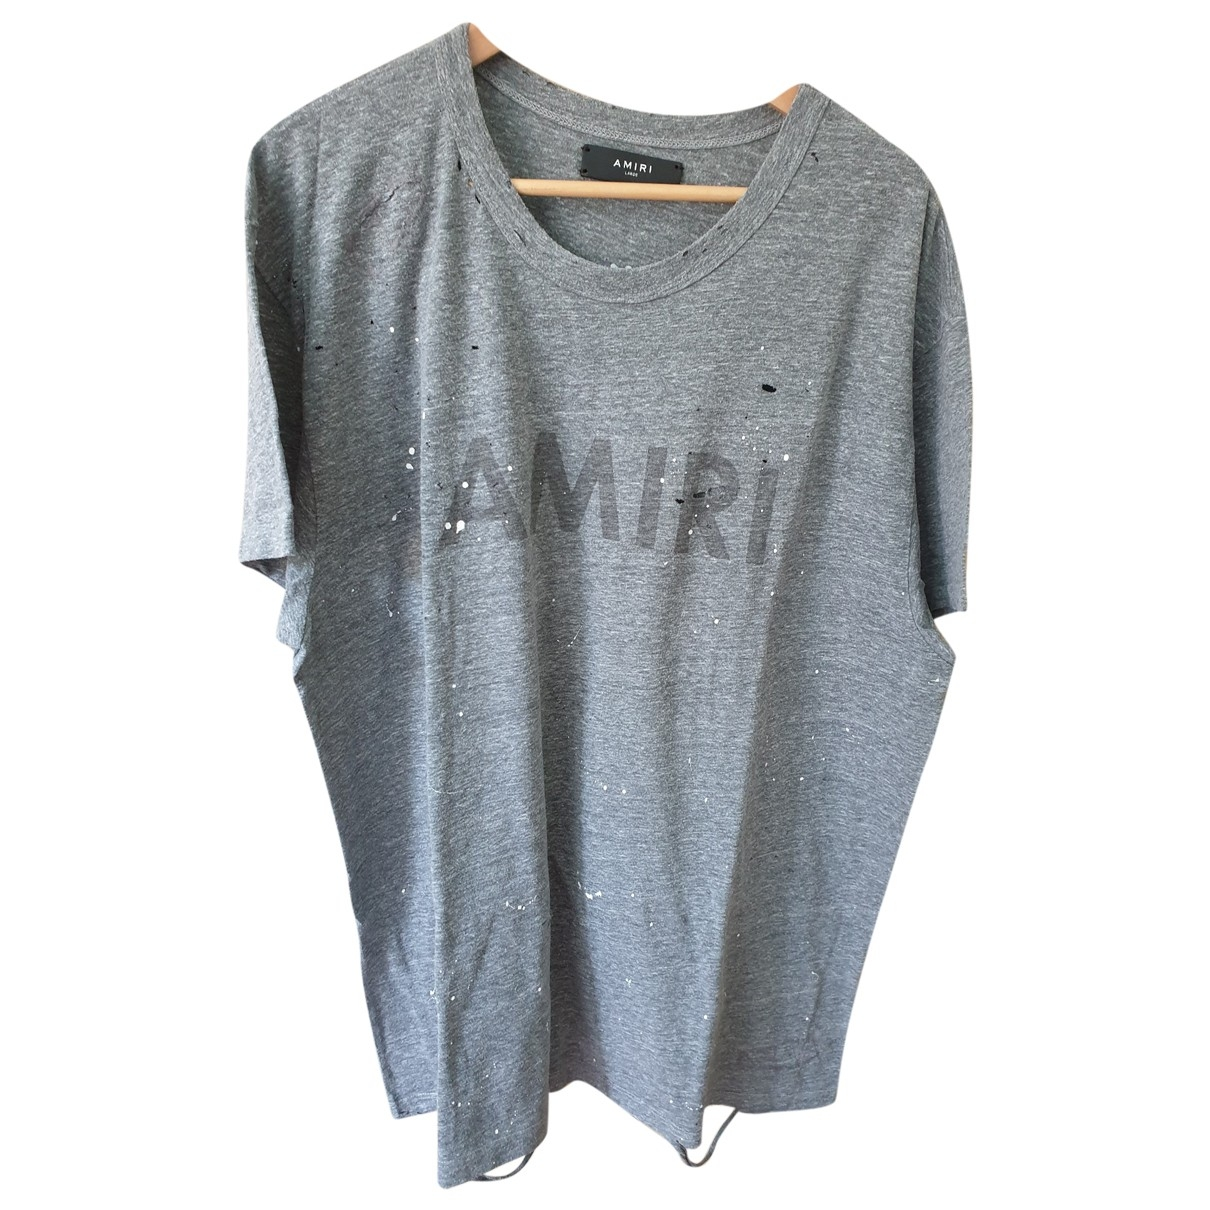 Amiri Grey Cotton T-shirt